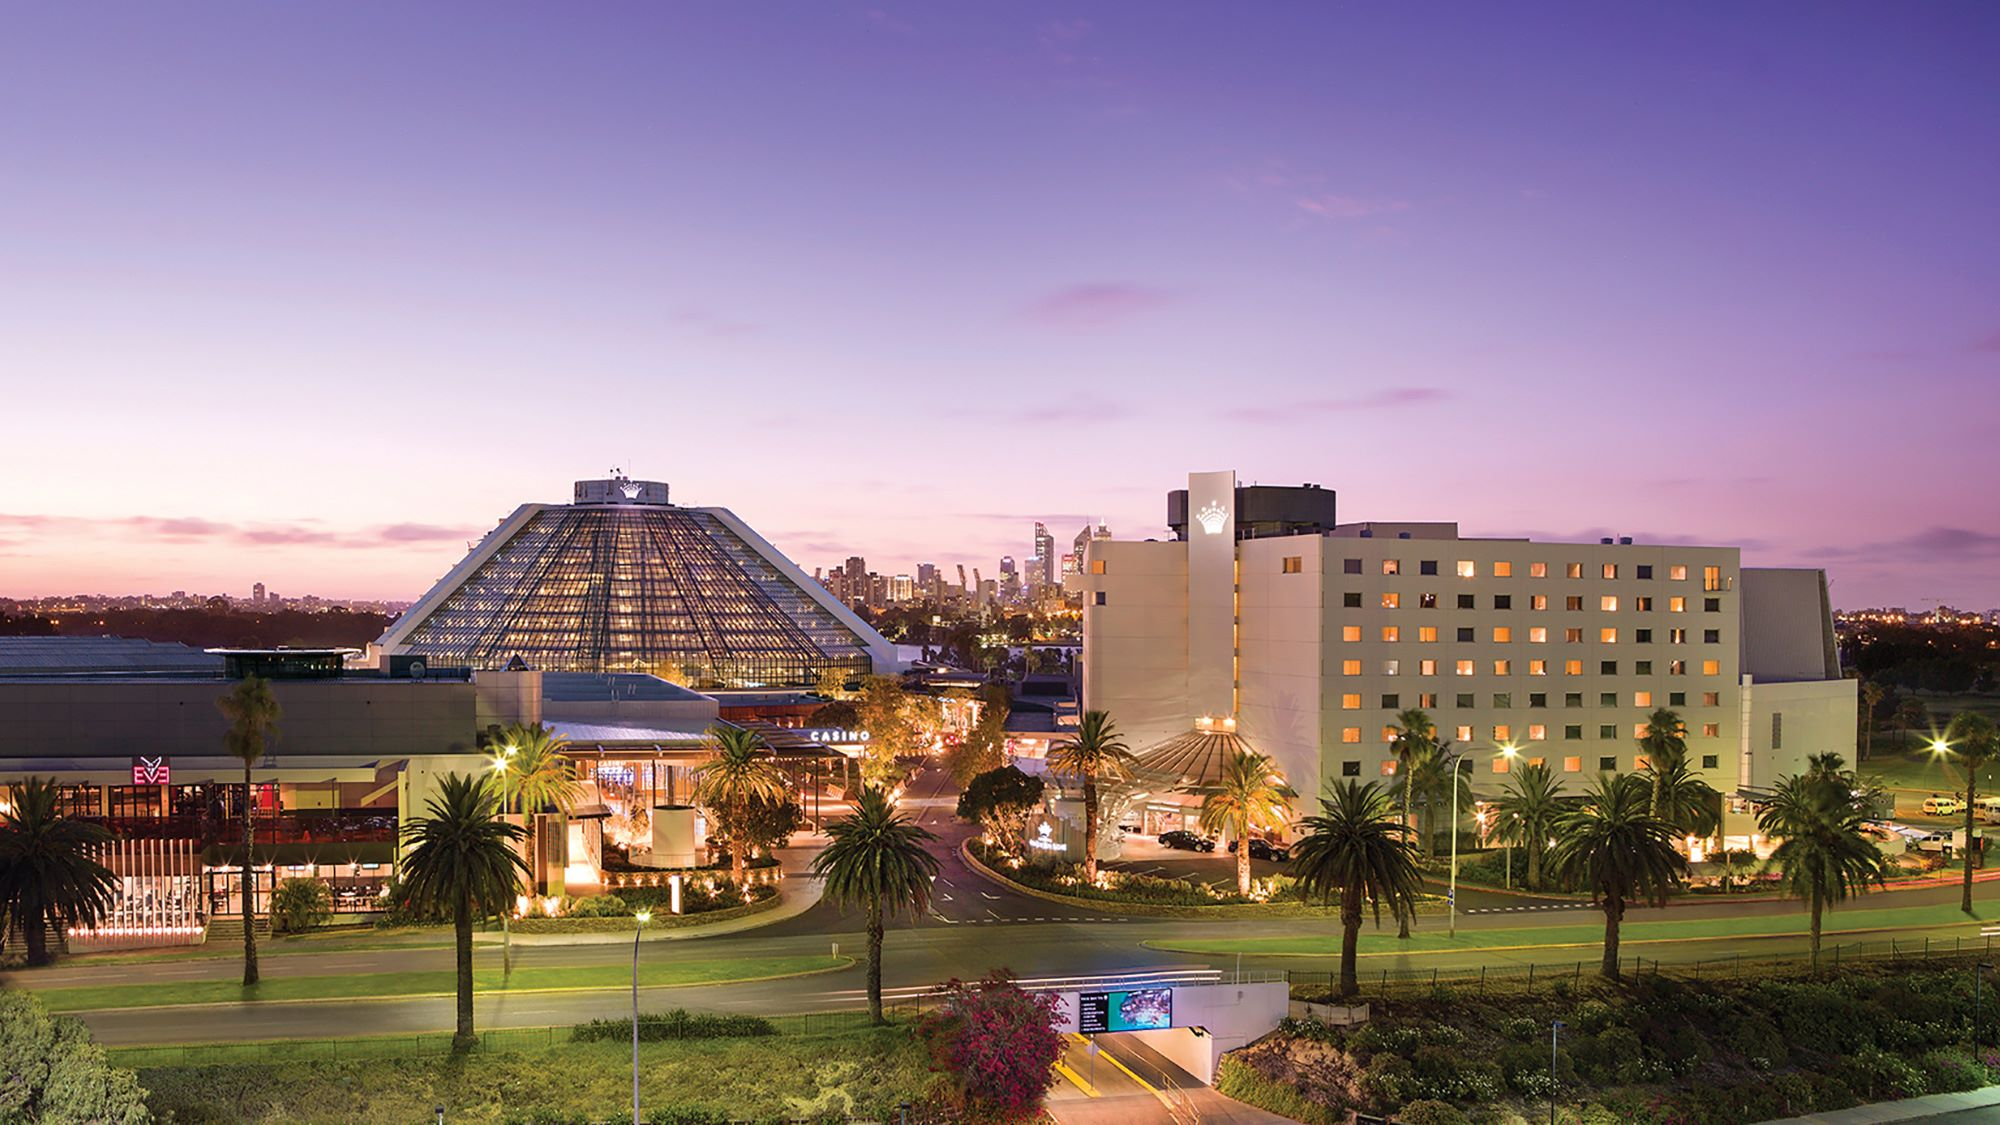 Crown Perth casino at dusk